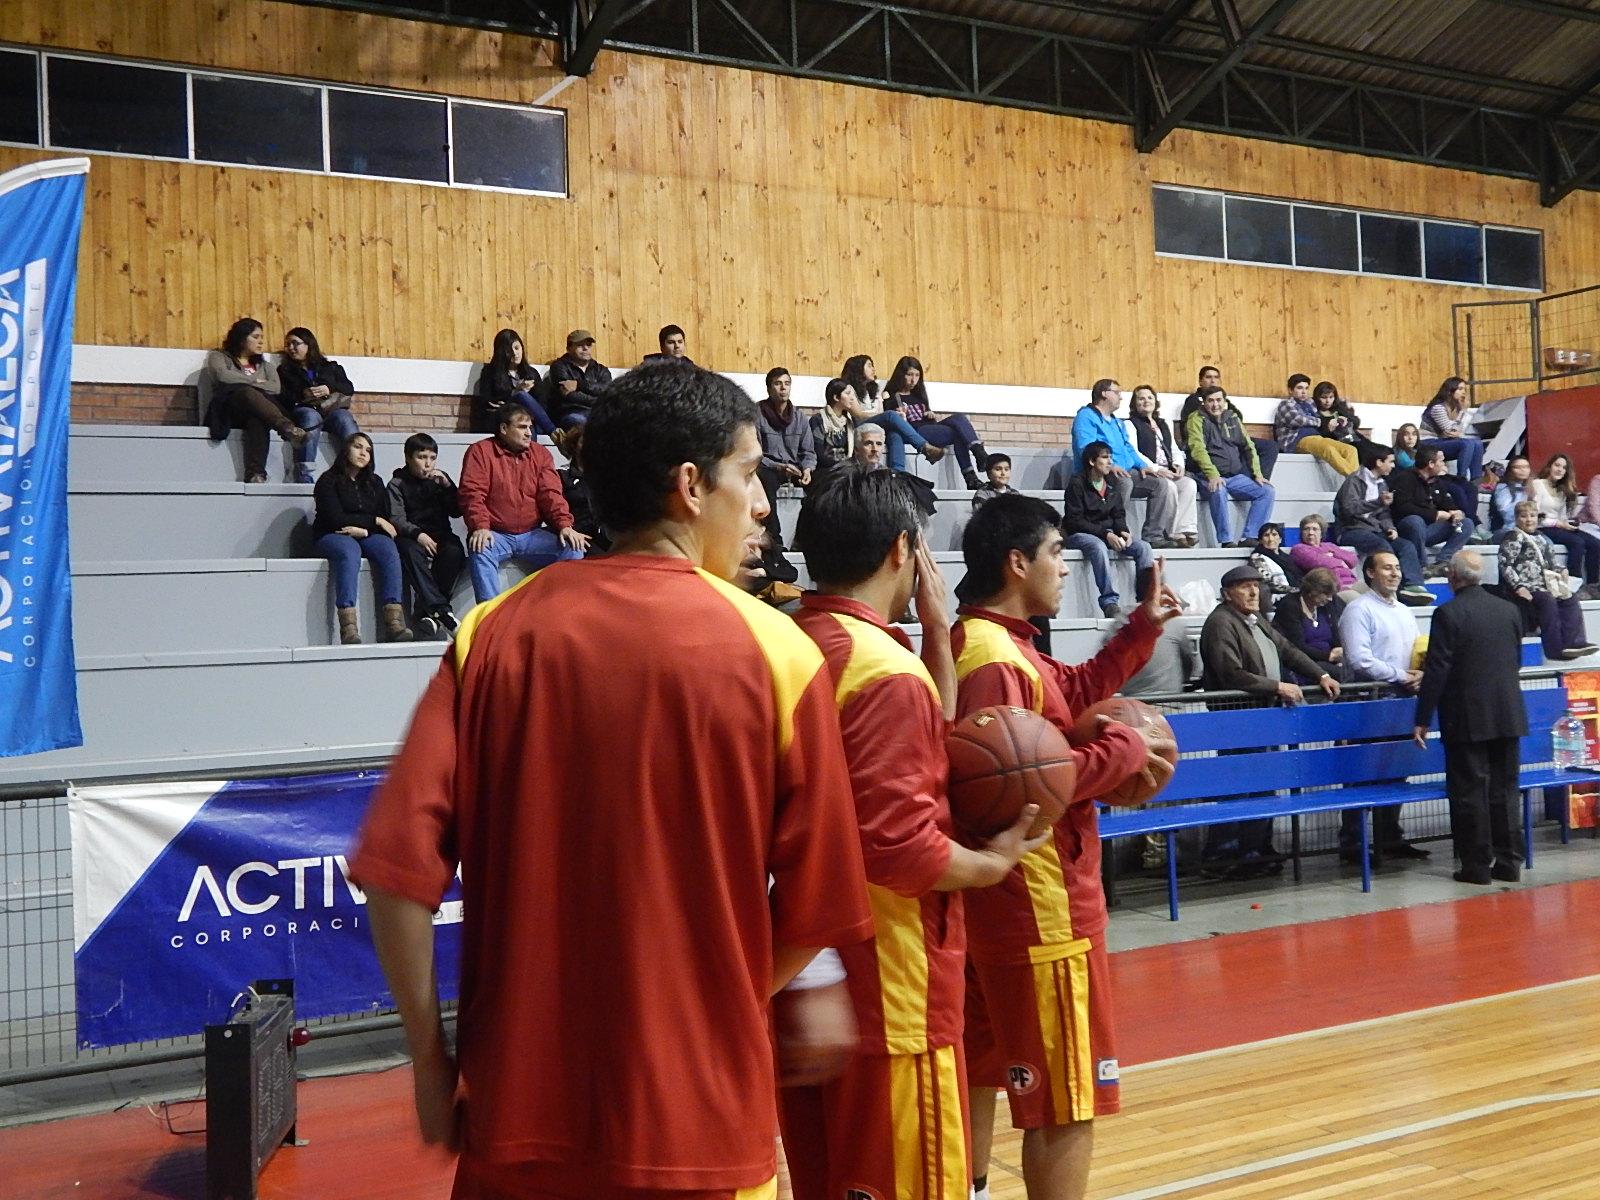 Juveniles de Español participarán en torneo internacional